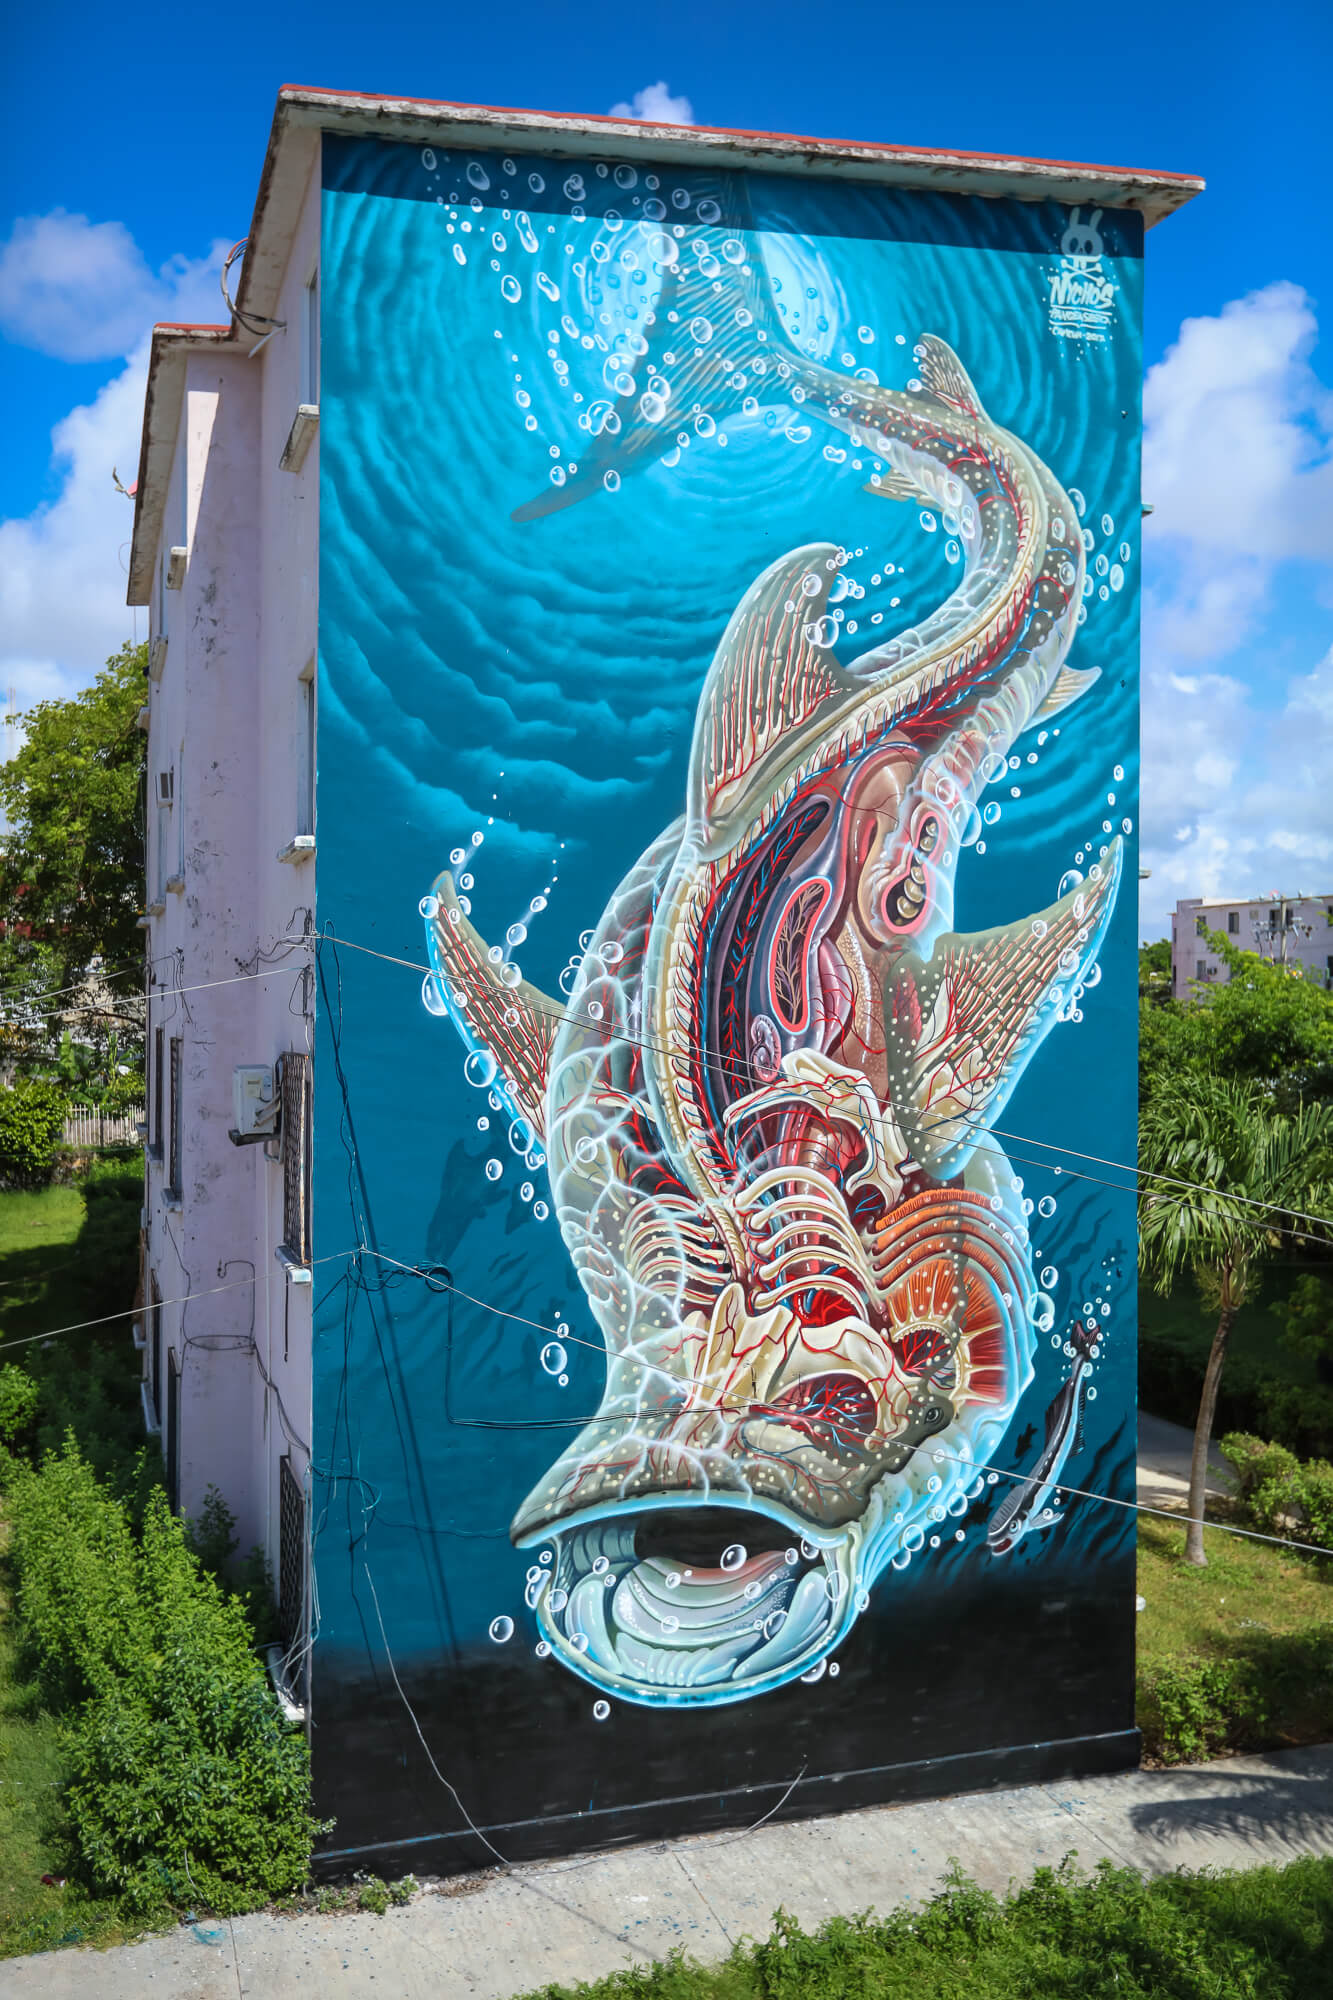 Nychos Murals